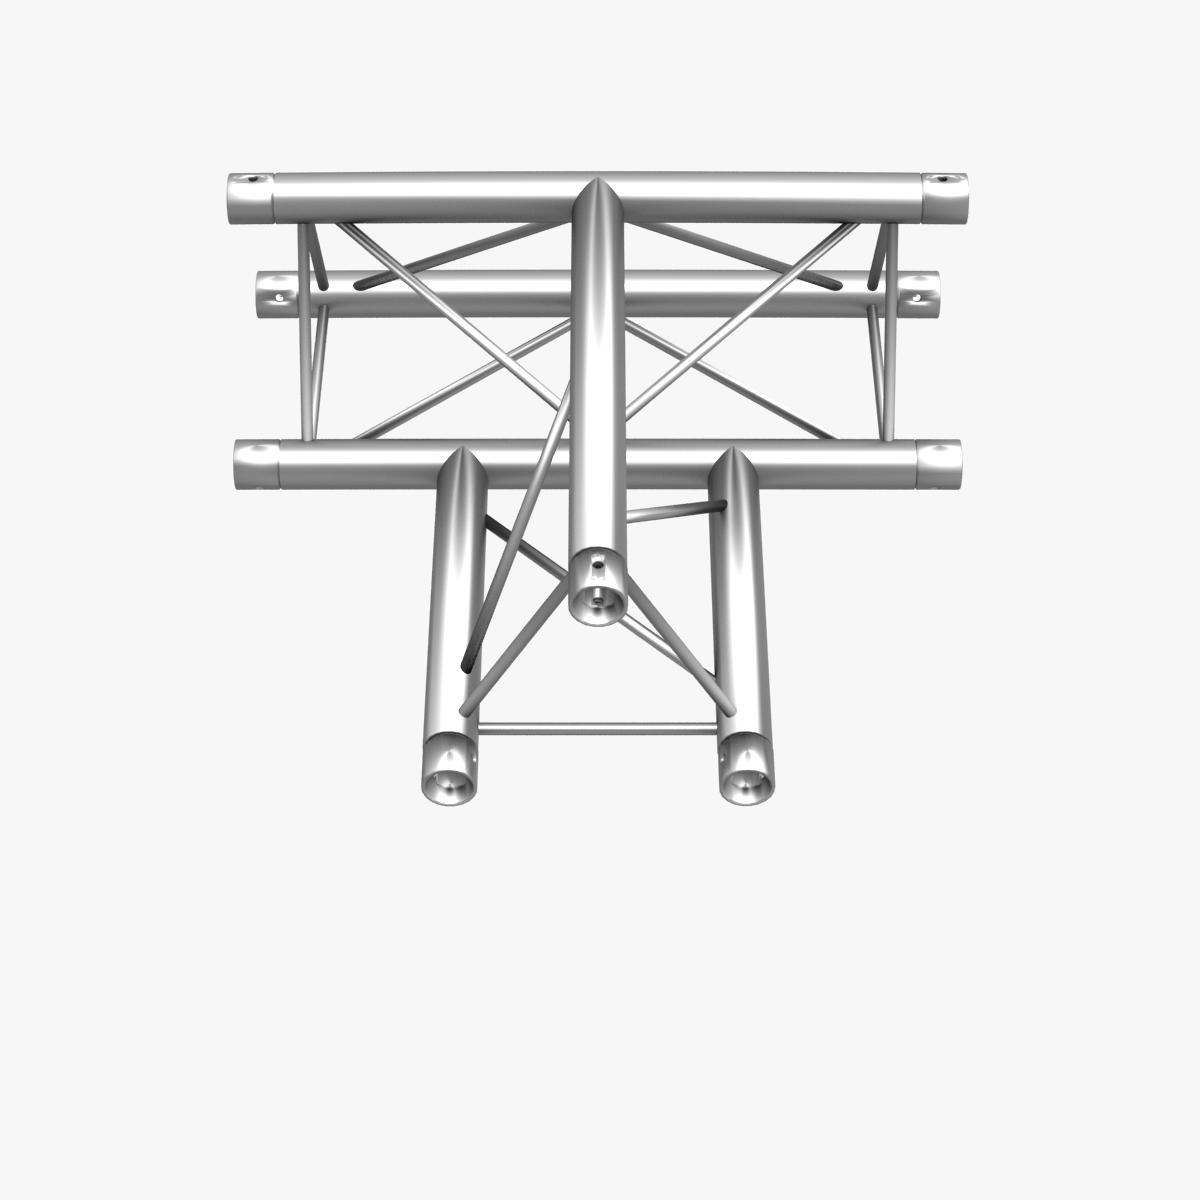 triangular trusses (collection 55 modular pieces) 3d model 3ds max dxf fbx c4d dae texture obj 216255